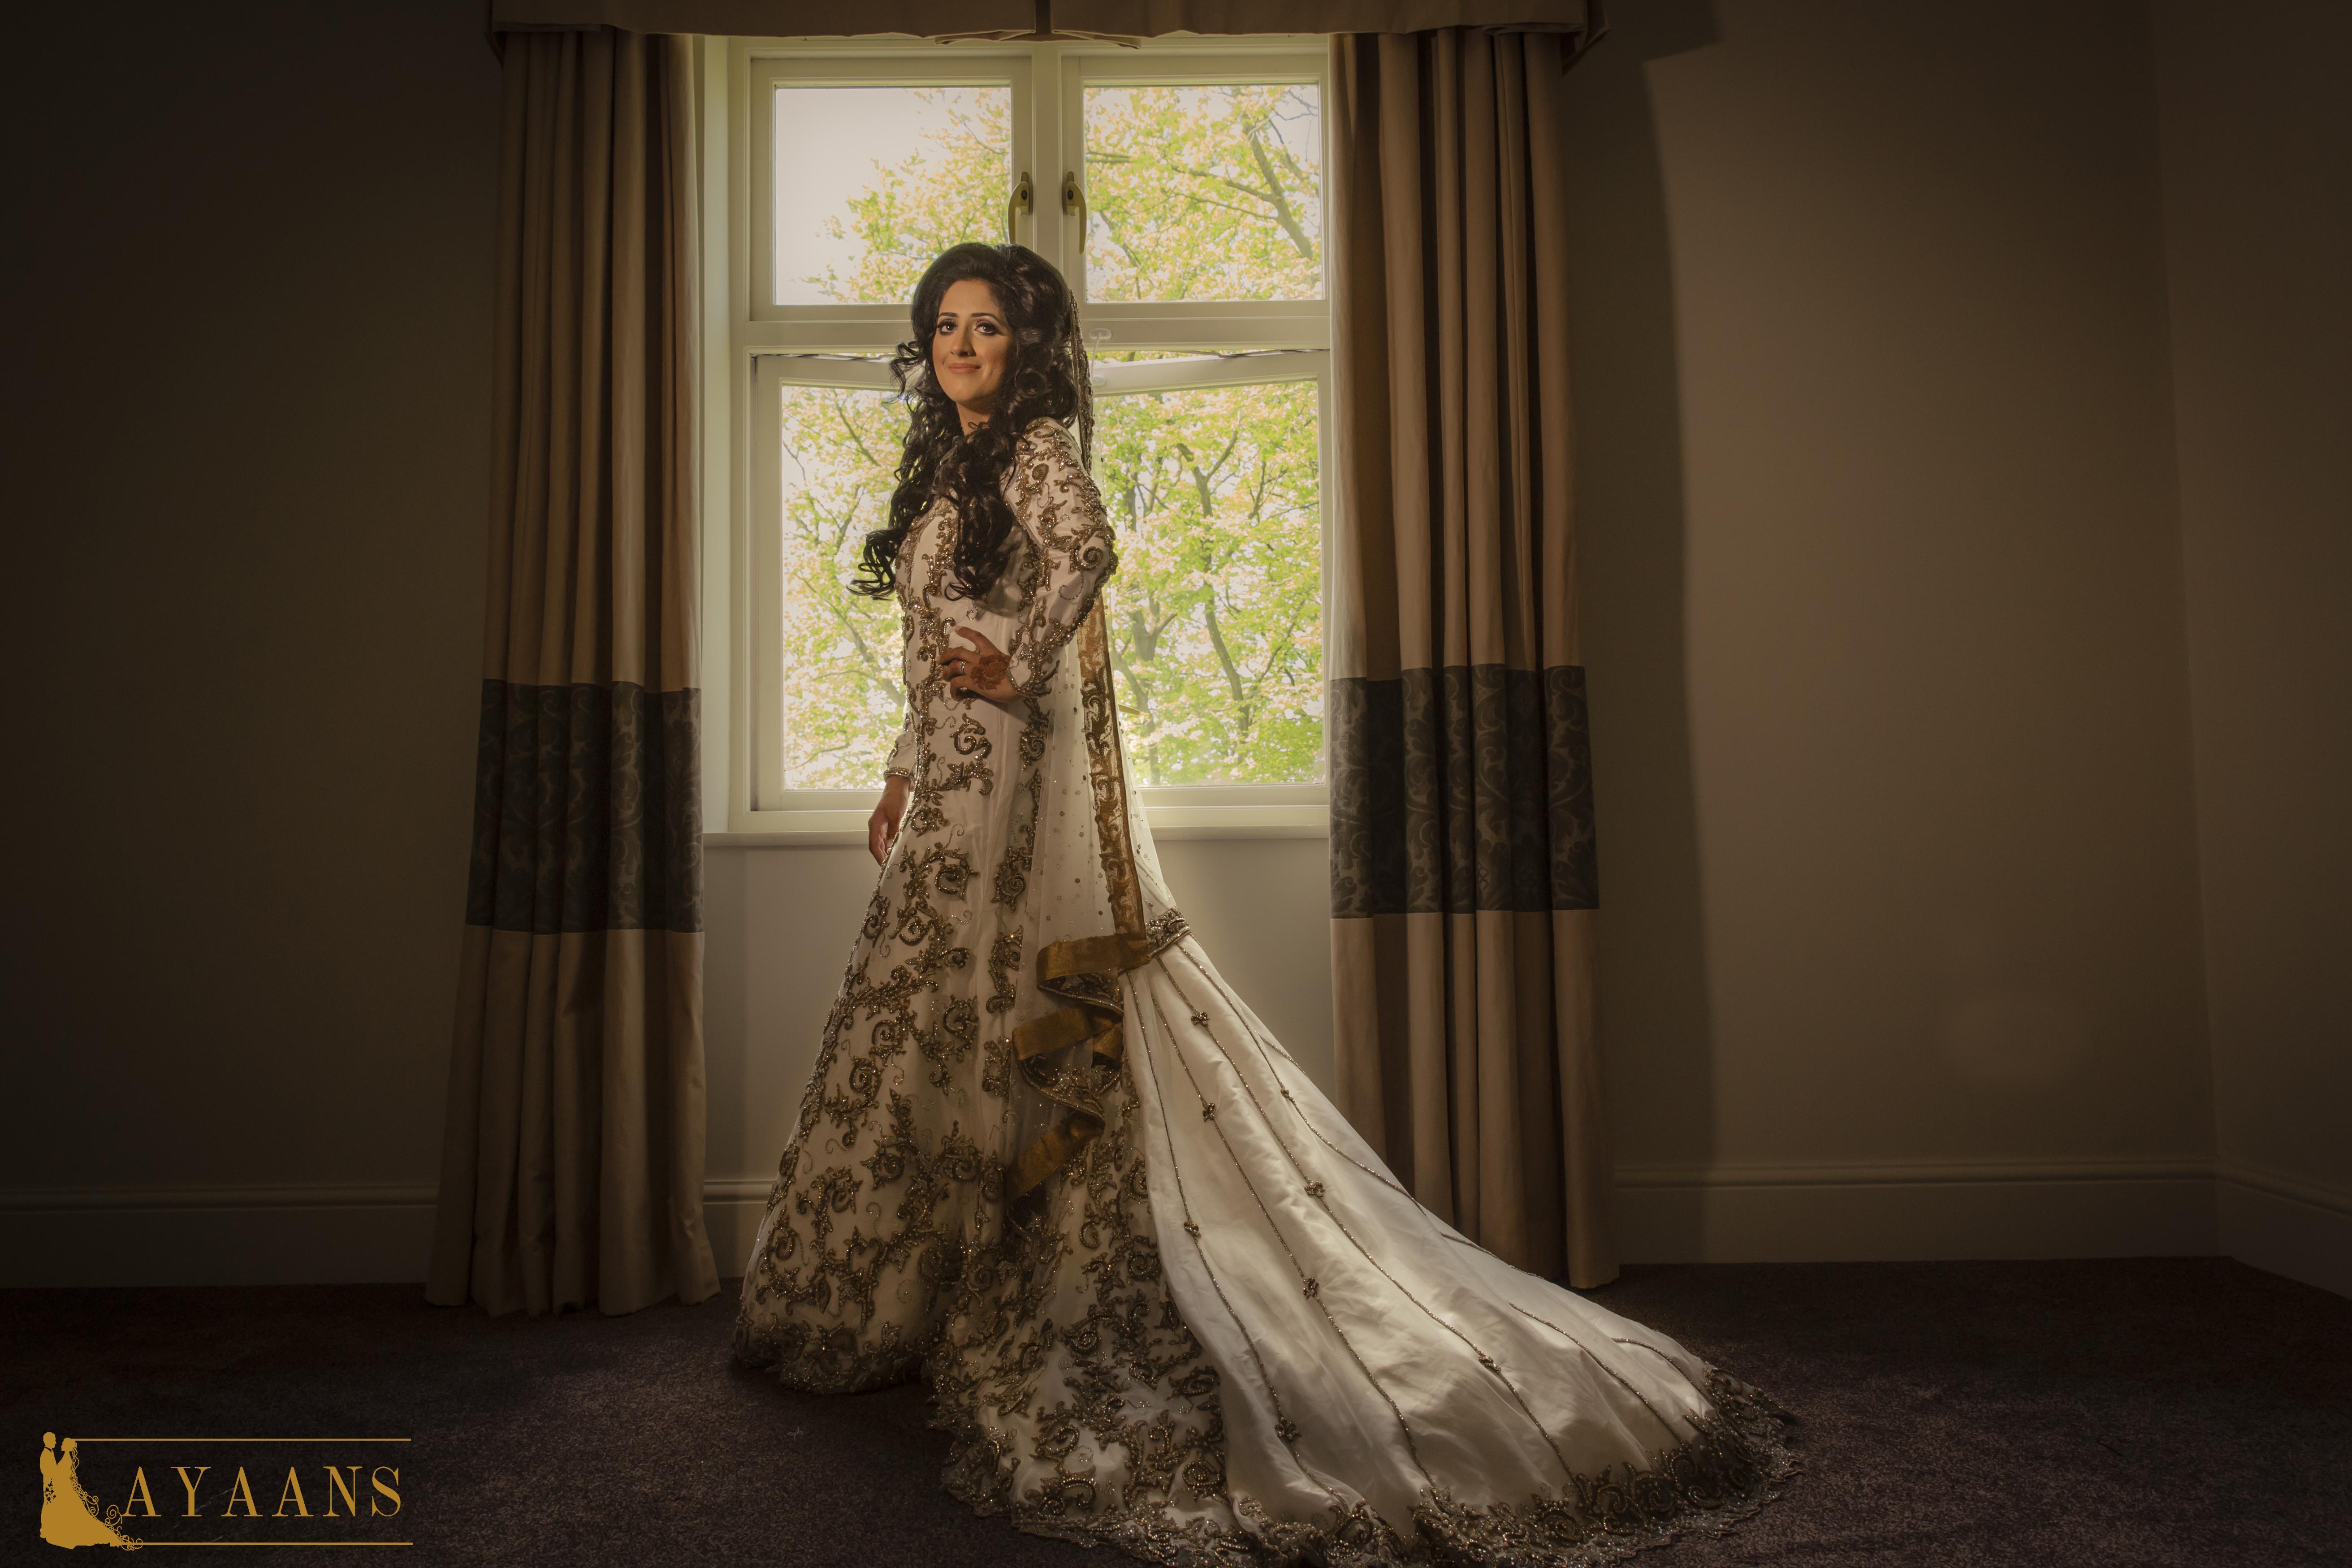 1-shazia-portrait-at-mercure-dunkenhalgh-hotel-accrington